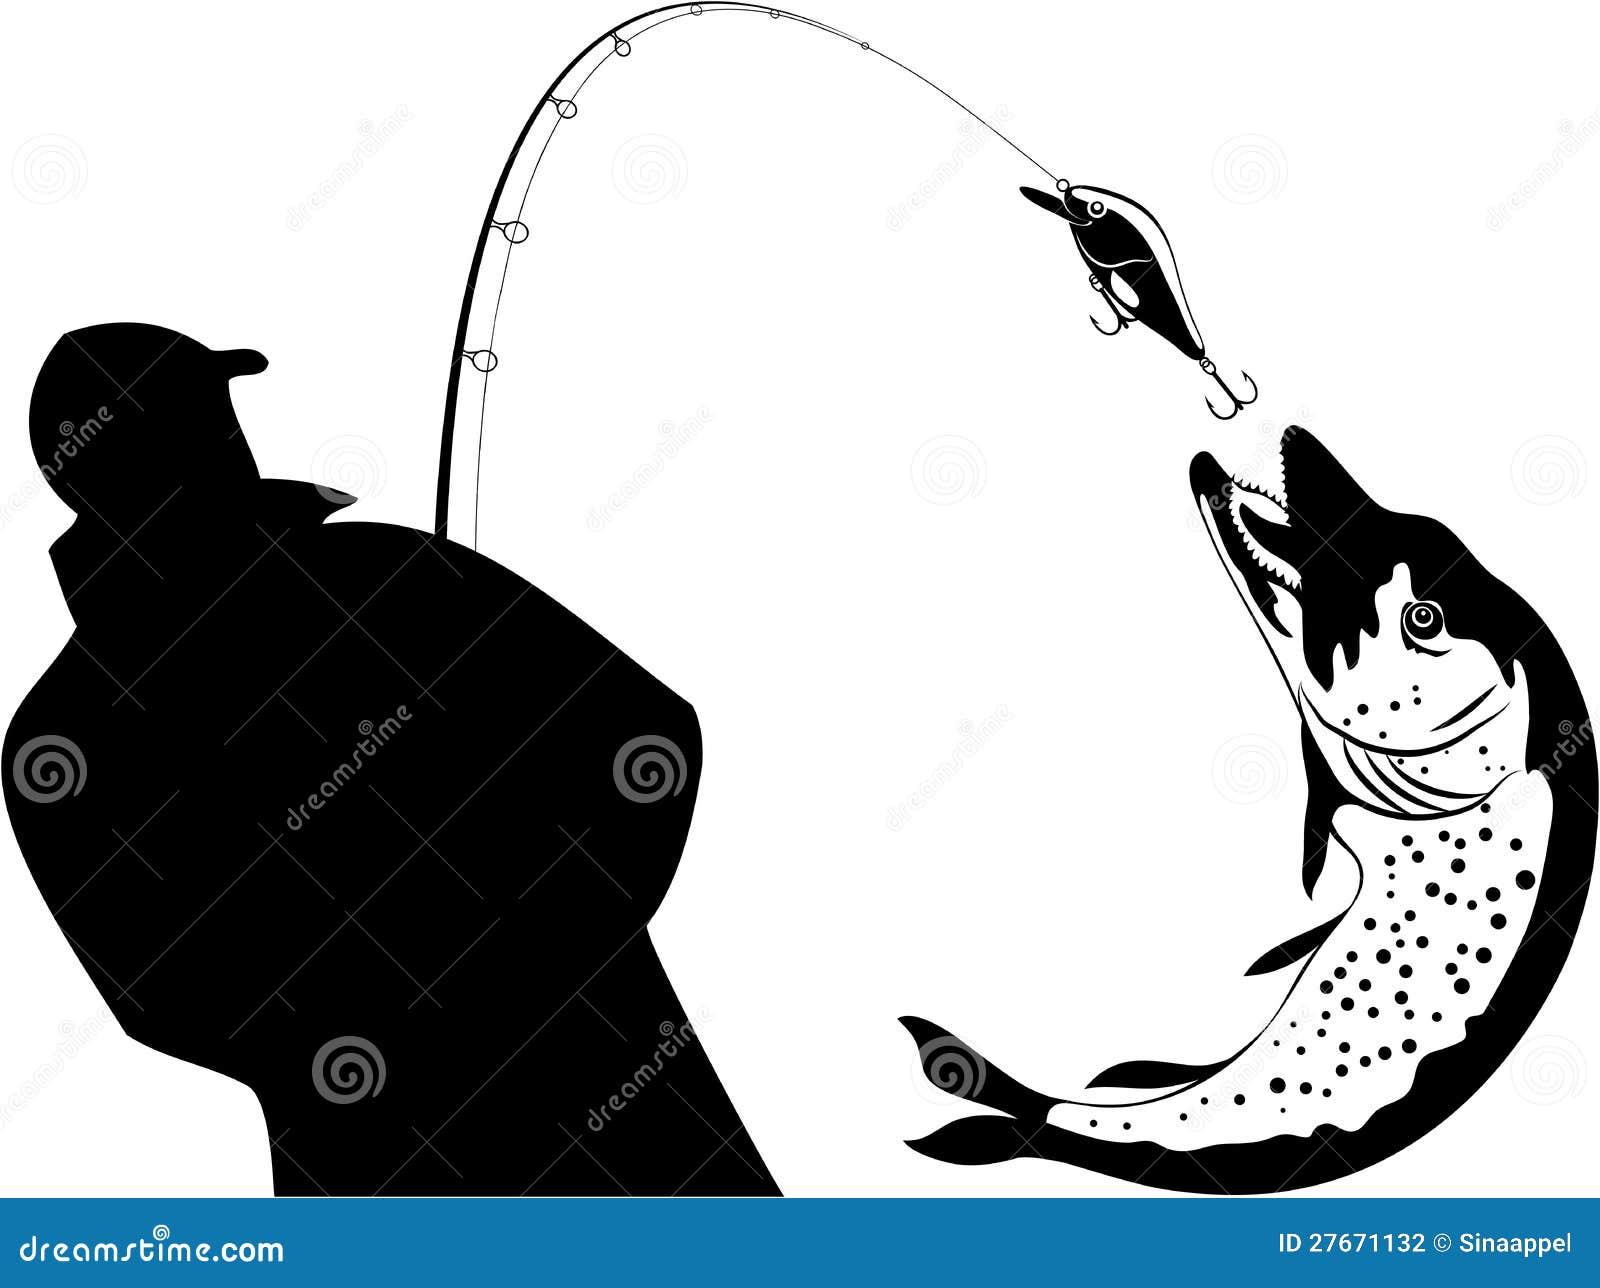 Fishing, Fisherman And Pike, Vector Illustration Stock ...